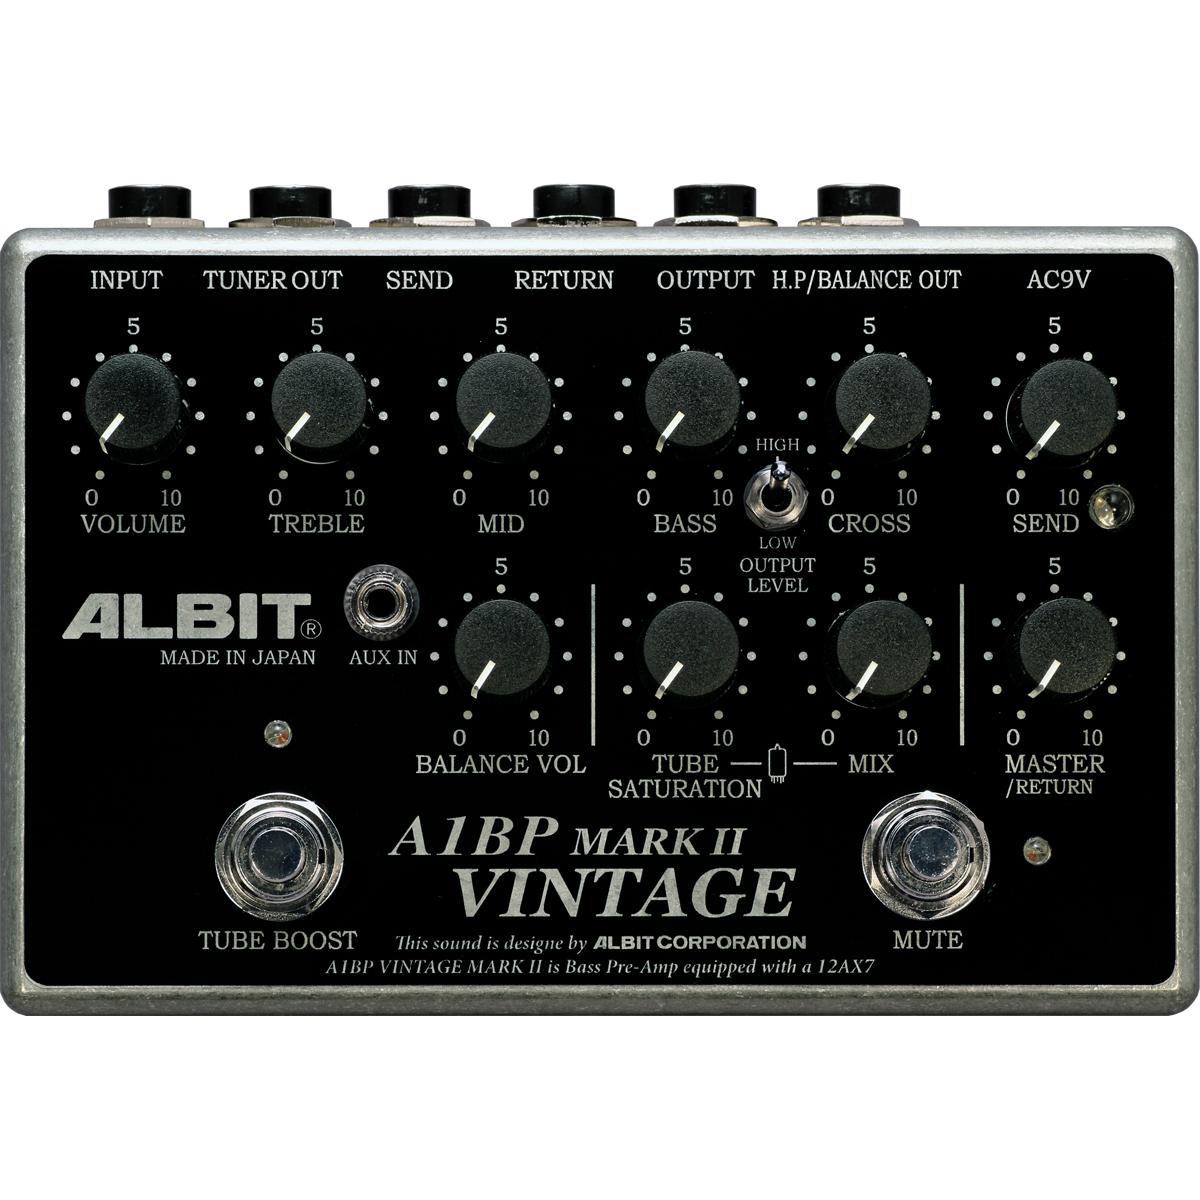 ALBIT A1BP VINTAGE MARK II